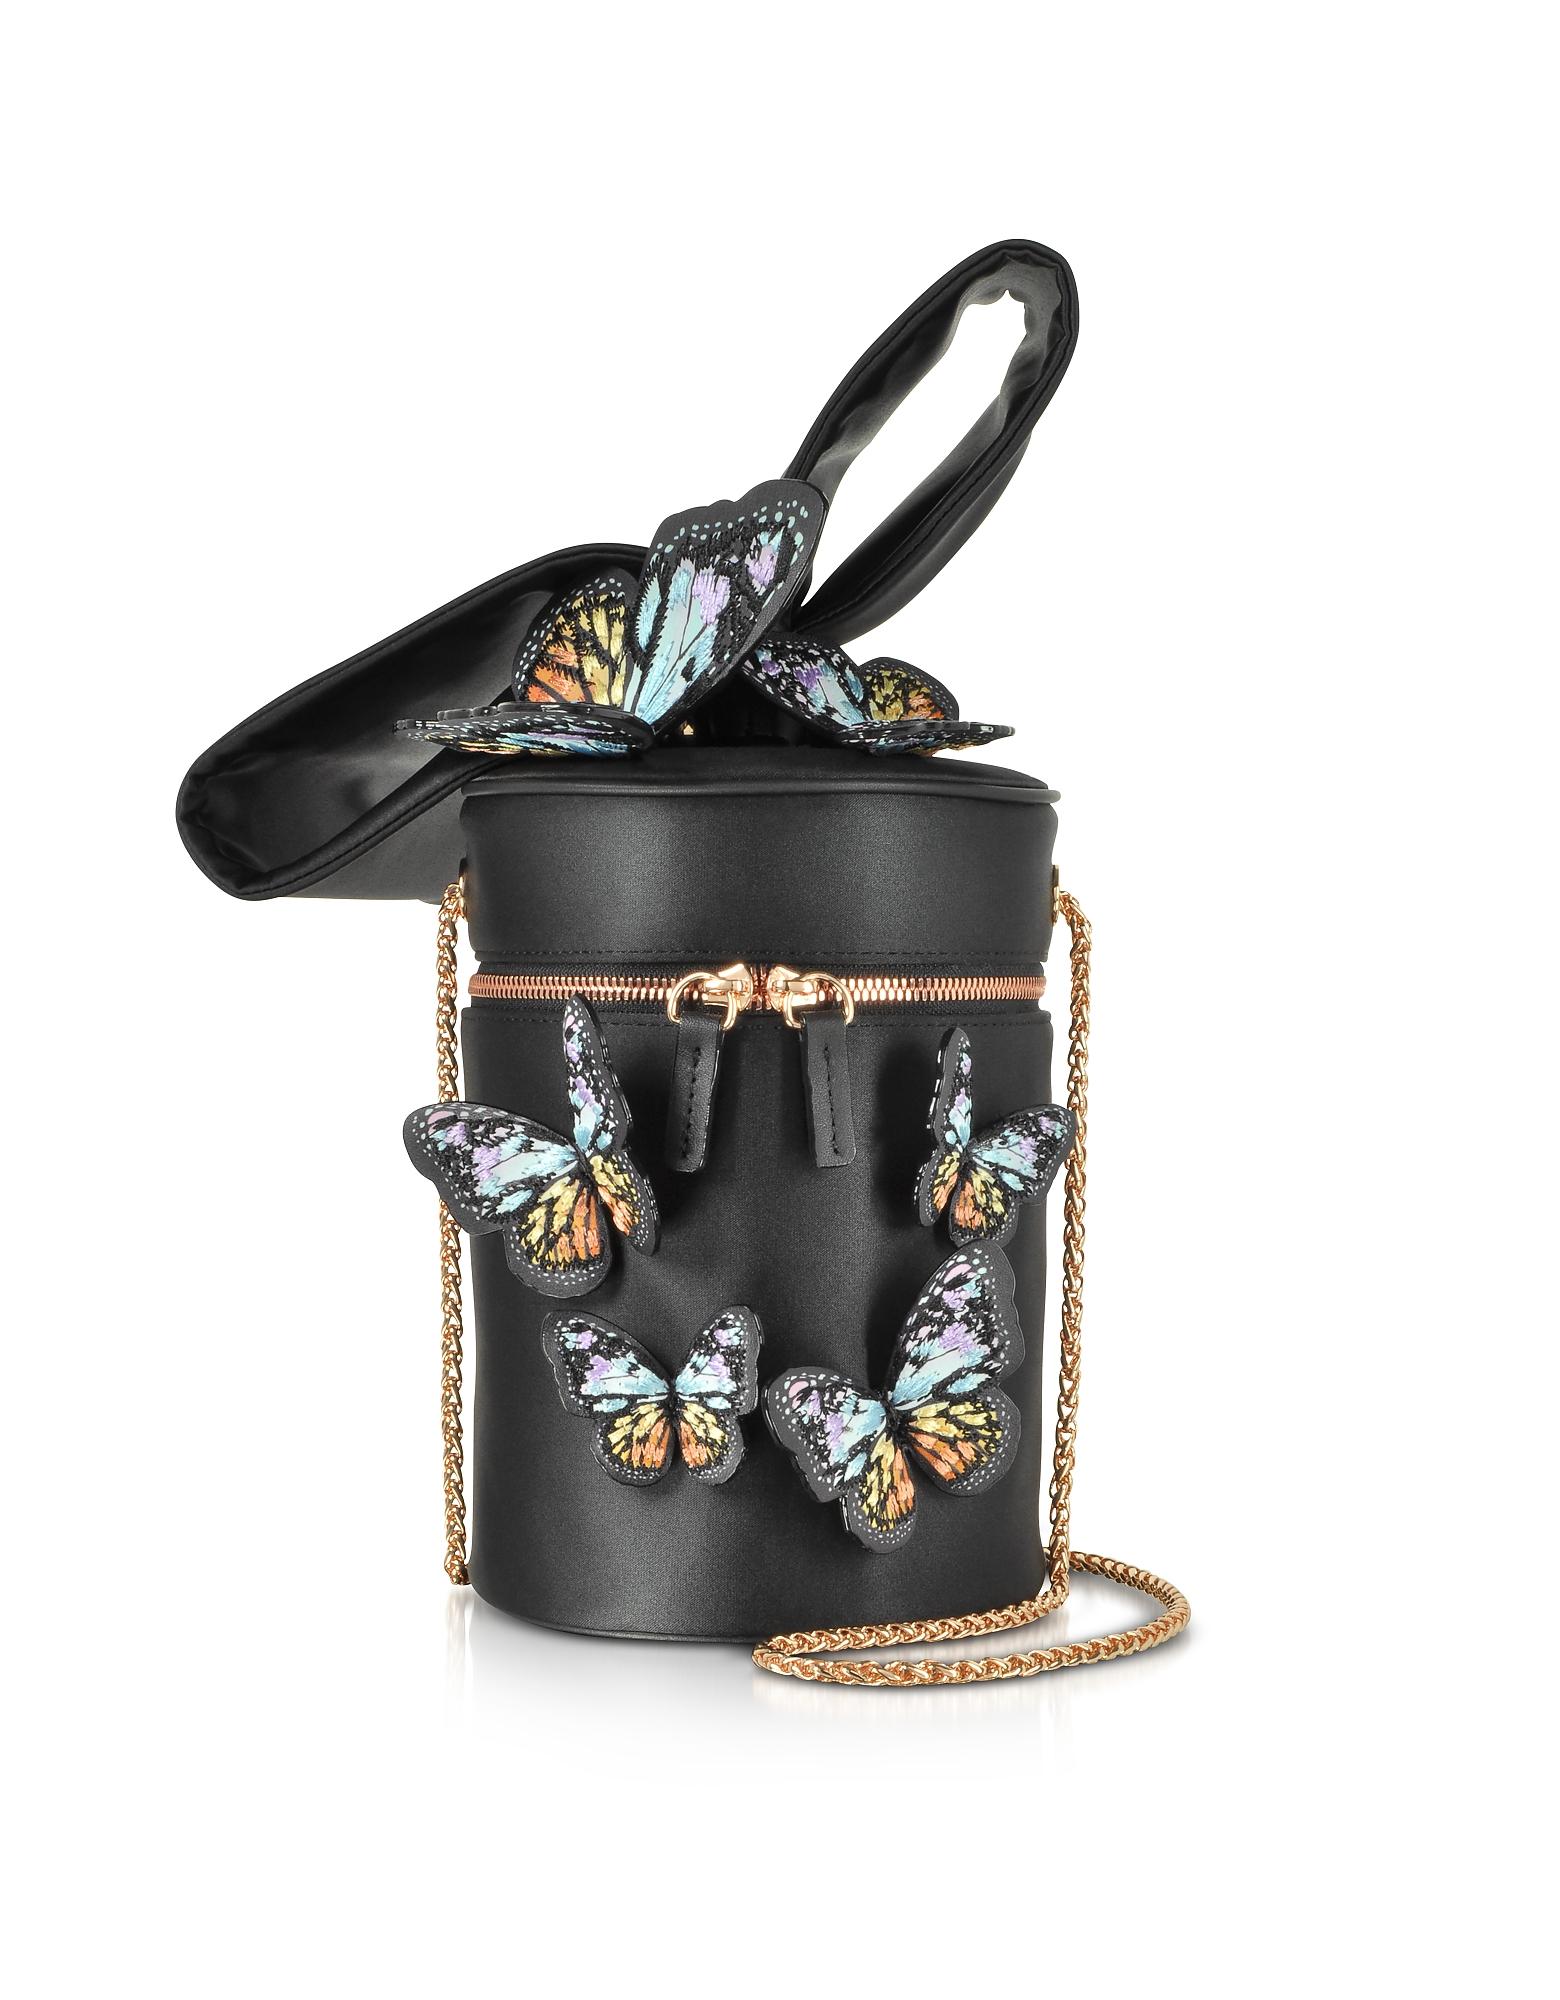 Sophia Webster Handbags, Black & Rainbow Bonnie Butterfly Cross Body Bag